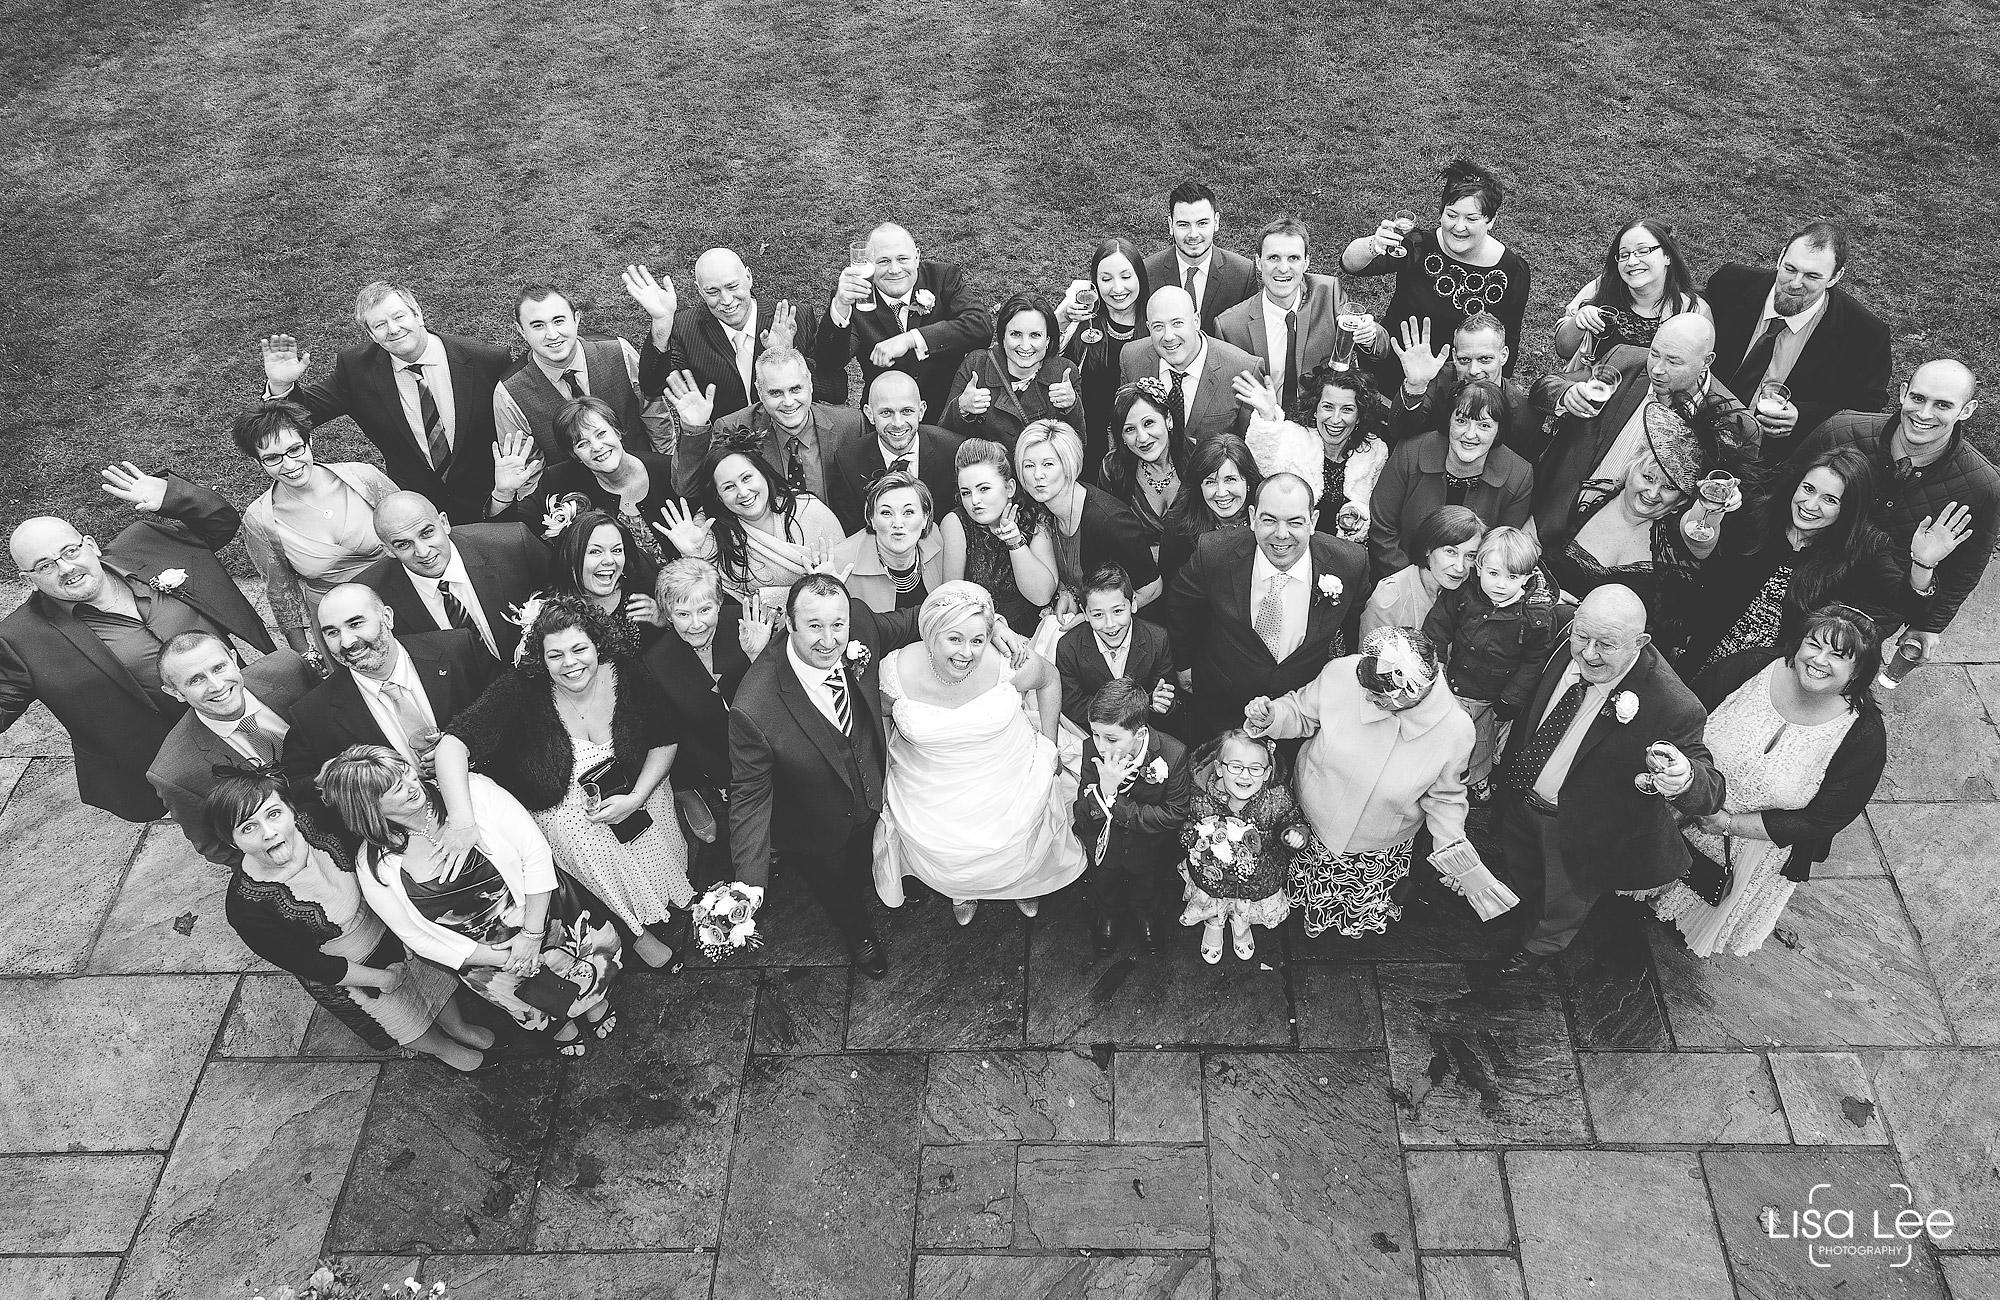 lisa-lee-wedding-photography-new-forest-dorset-groupshot.jpg